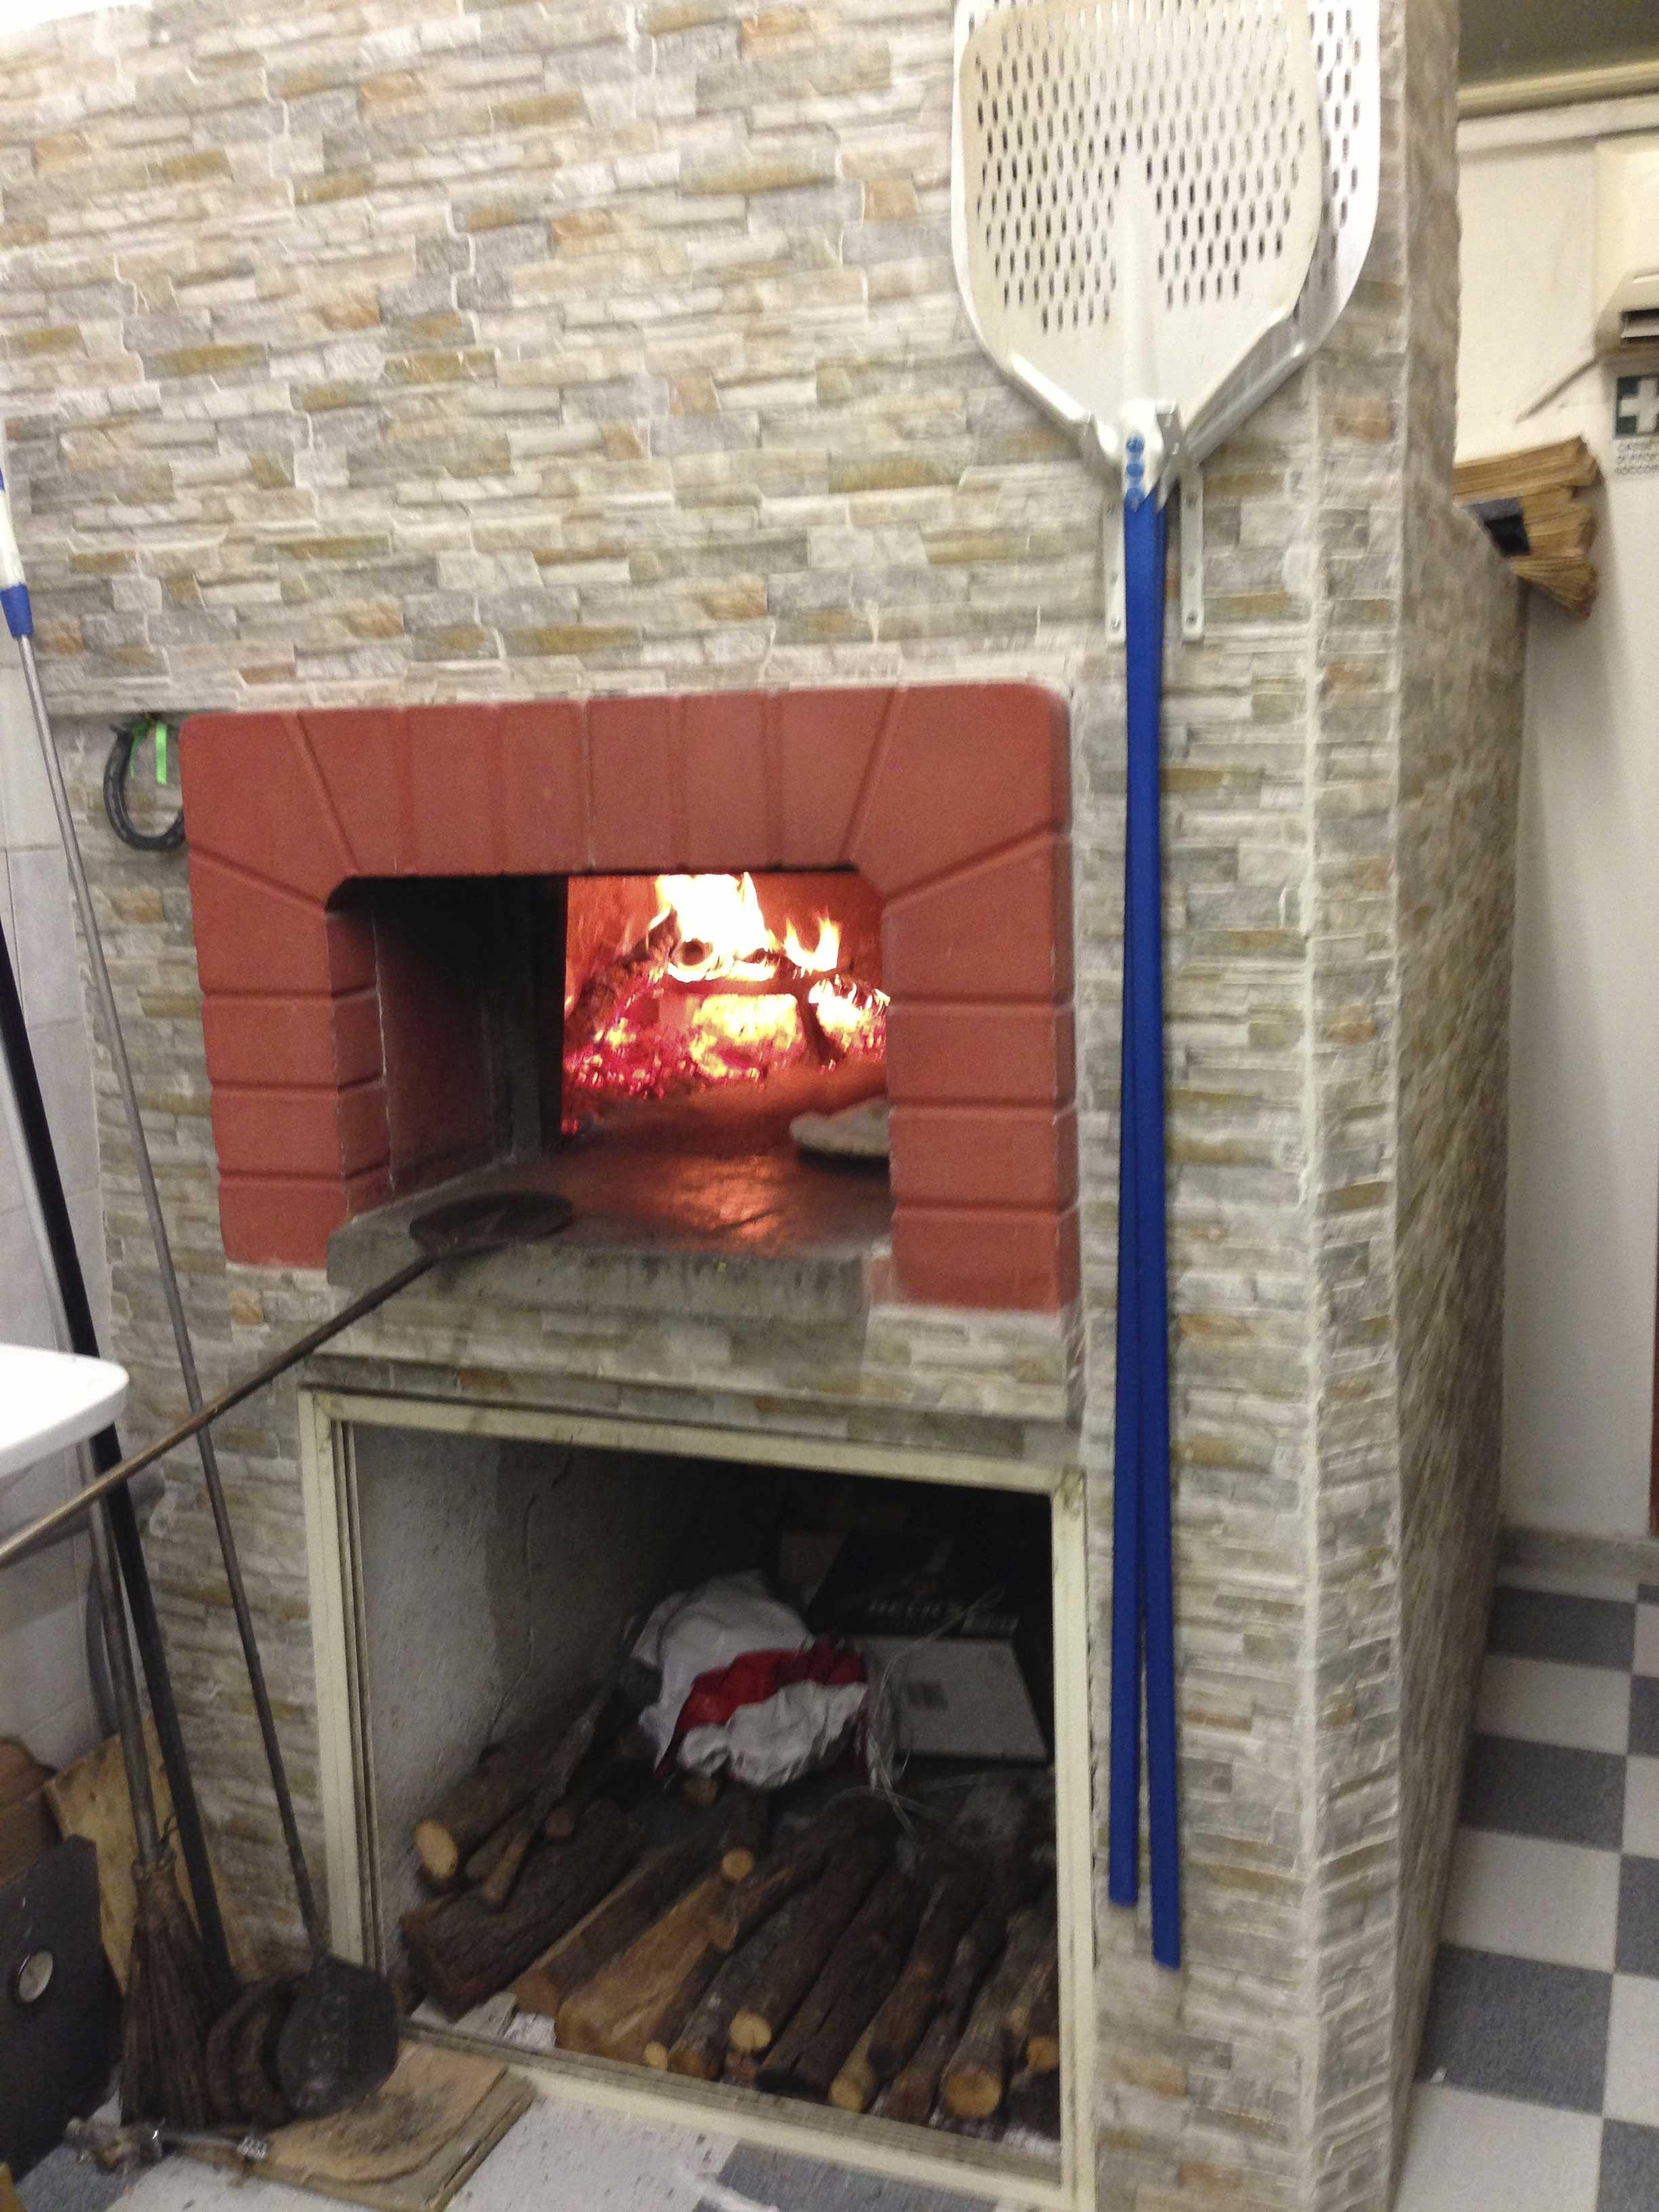 Zio Ciro Wood Fired Oven For Pizza Zio Ciro Italian Wood